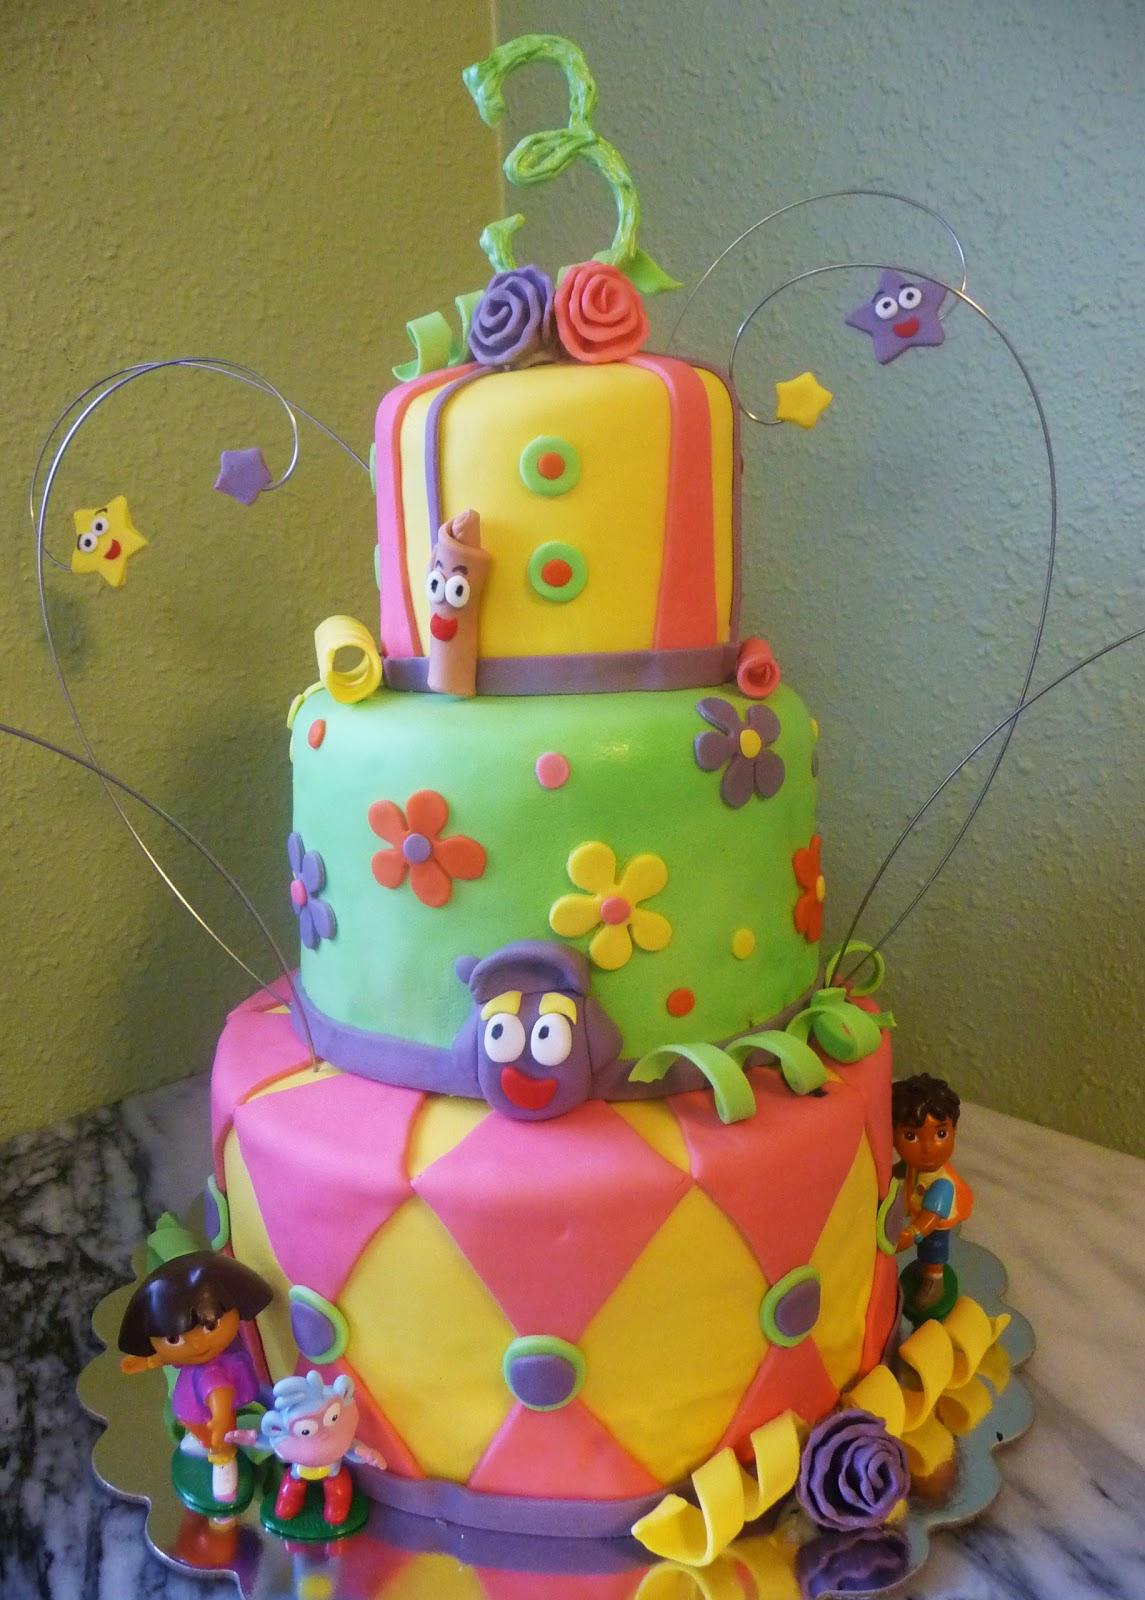 Pure Delights Baking Co.: Dora the Explorer Cake